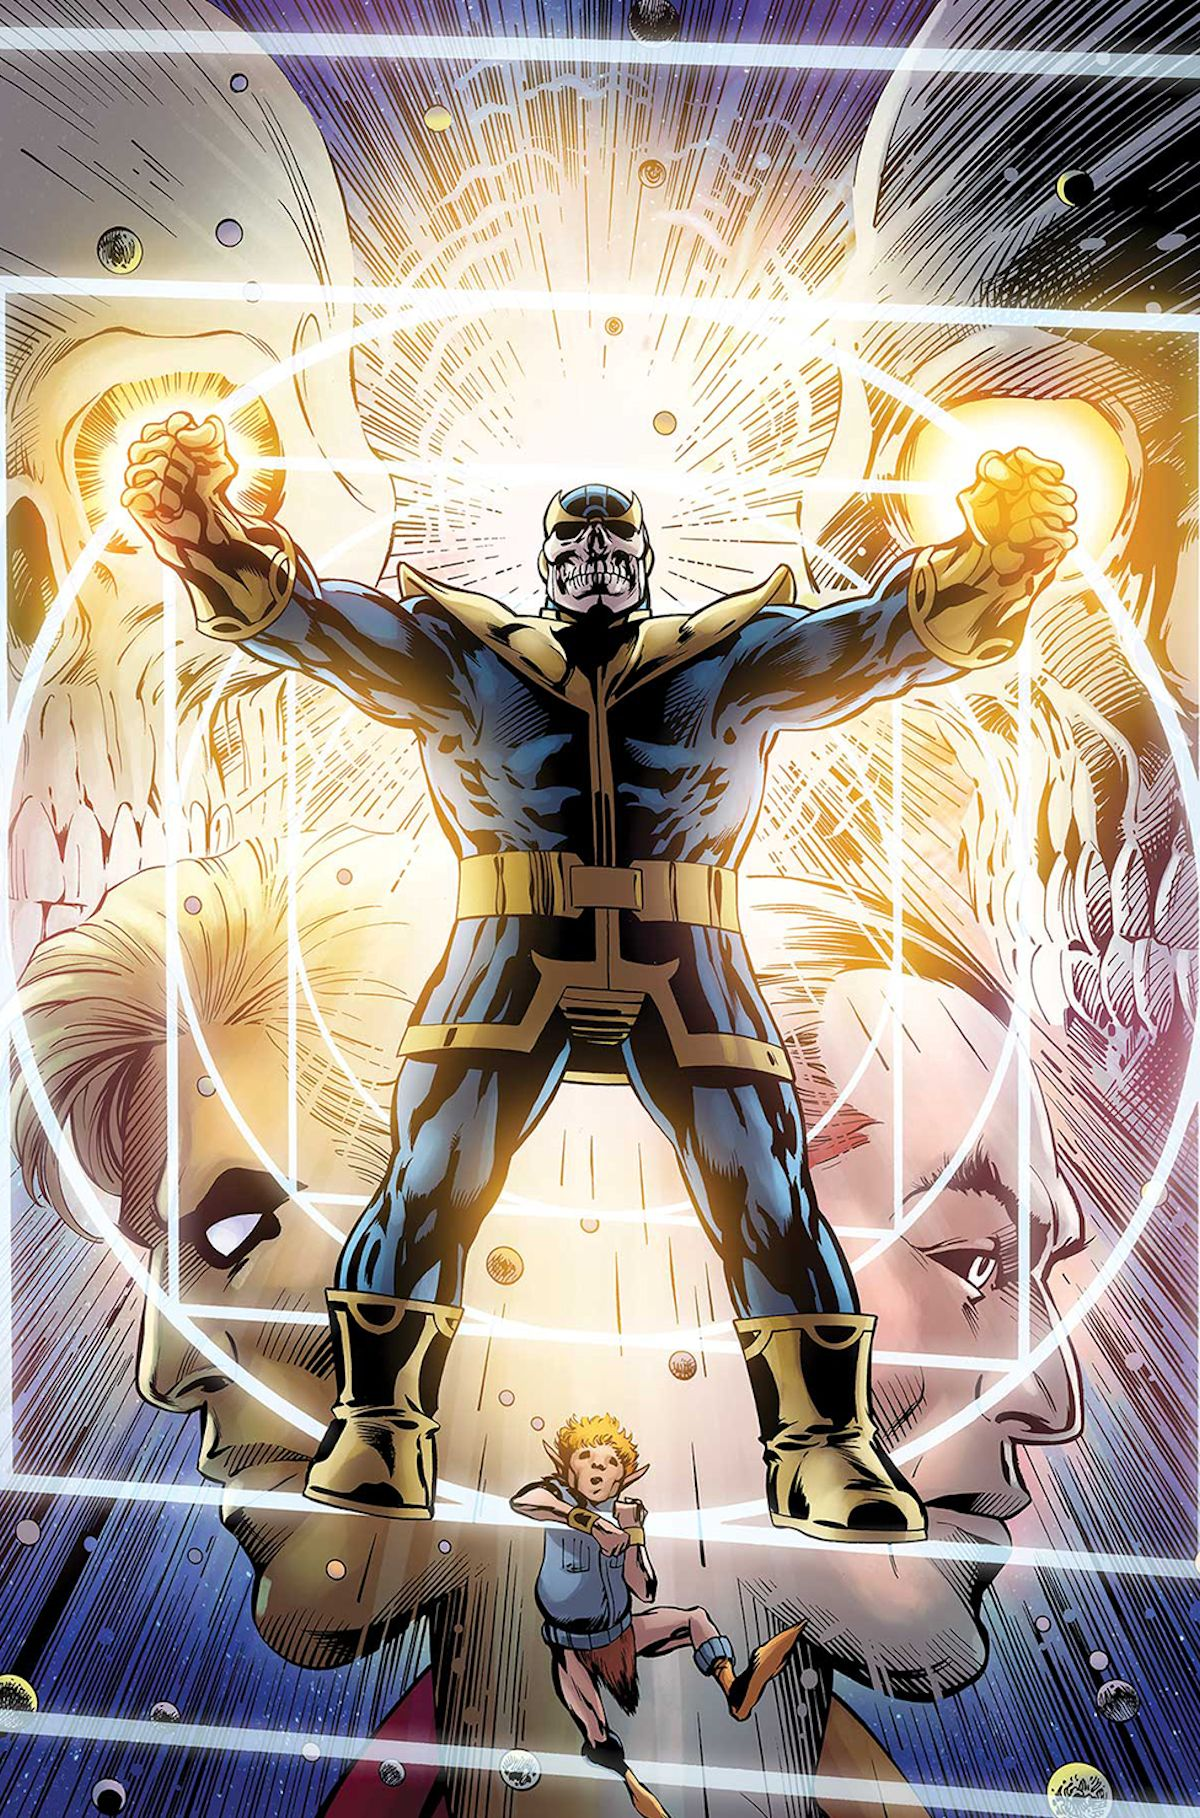 Thanos Infinity Ending (Original Hardcover Graphic Novel)